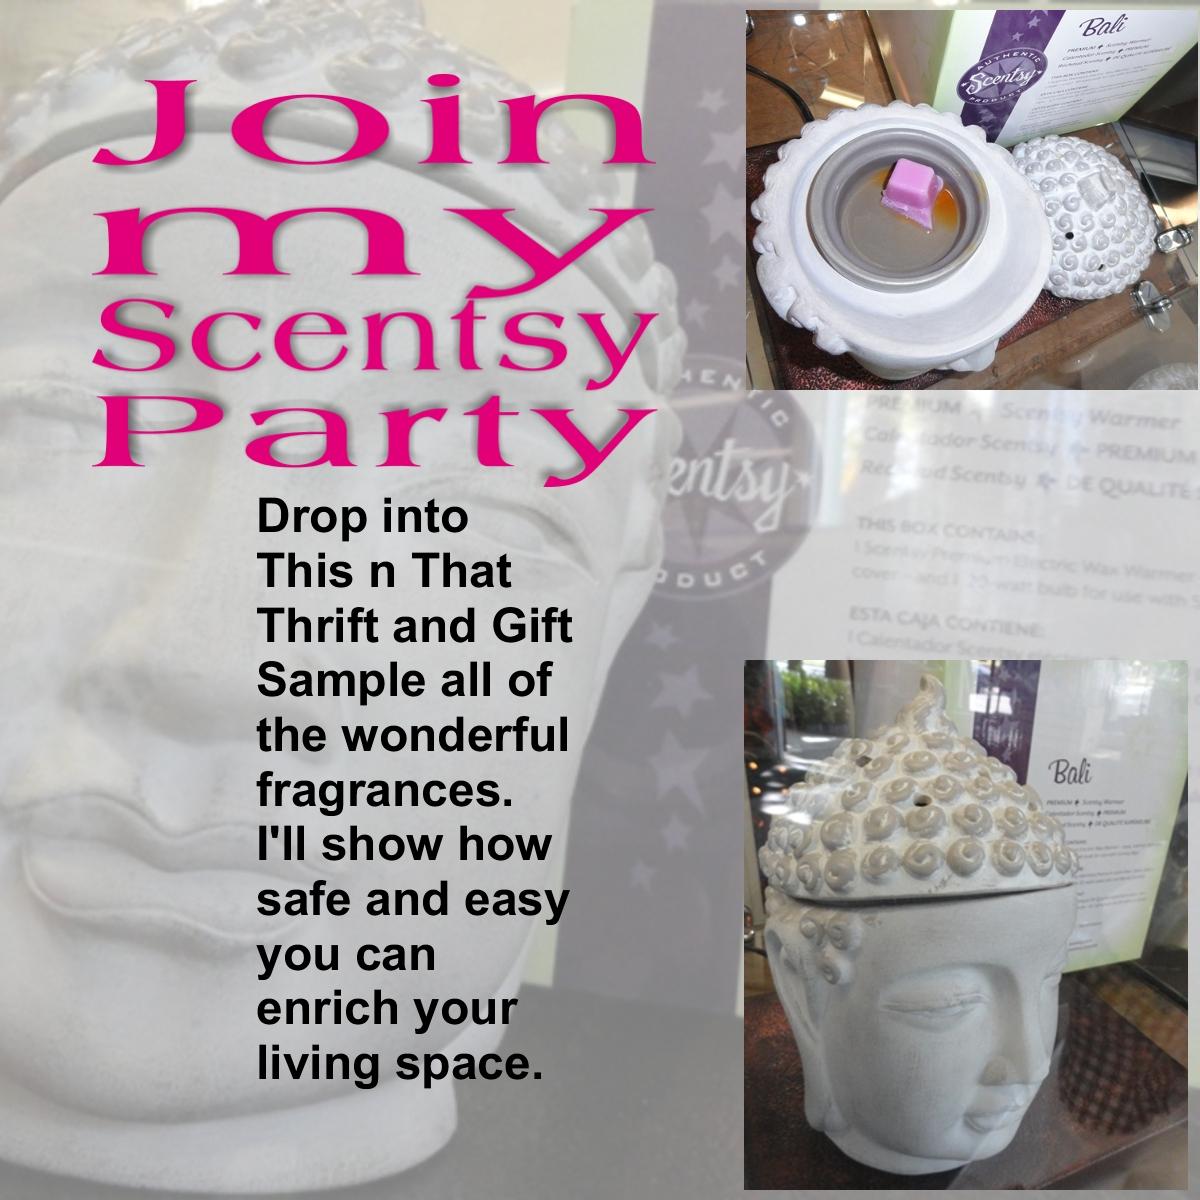 Scentsy Poster-001.jpg